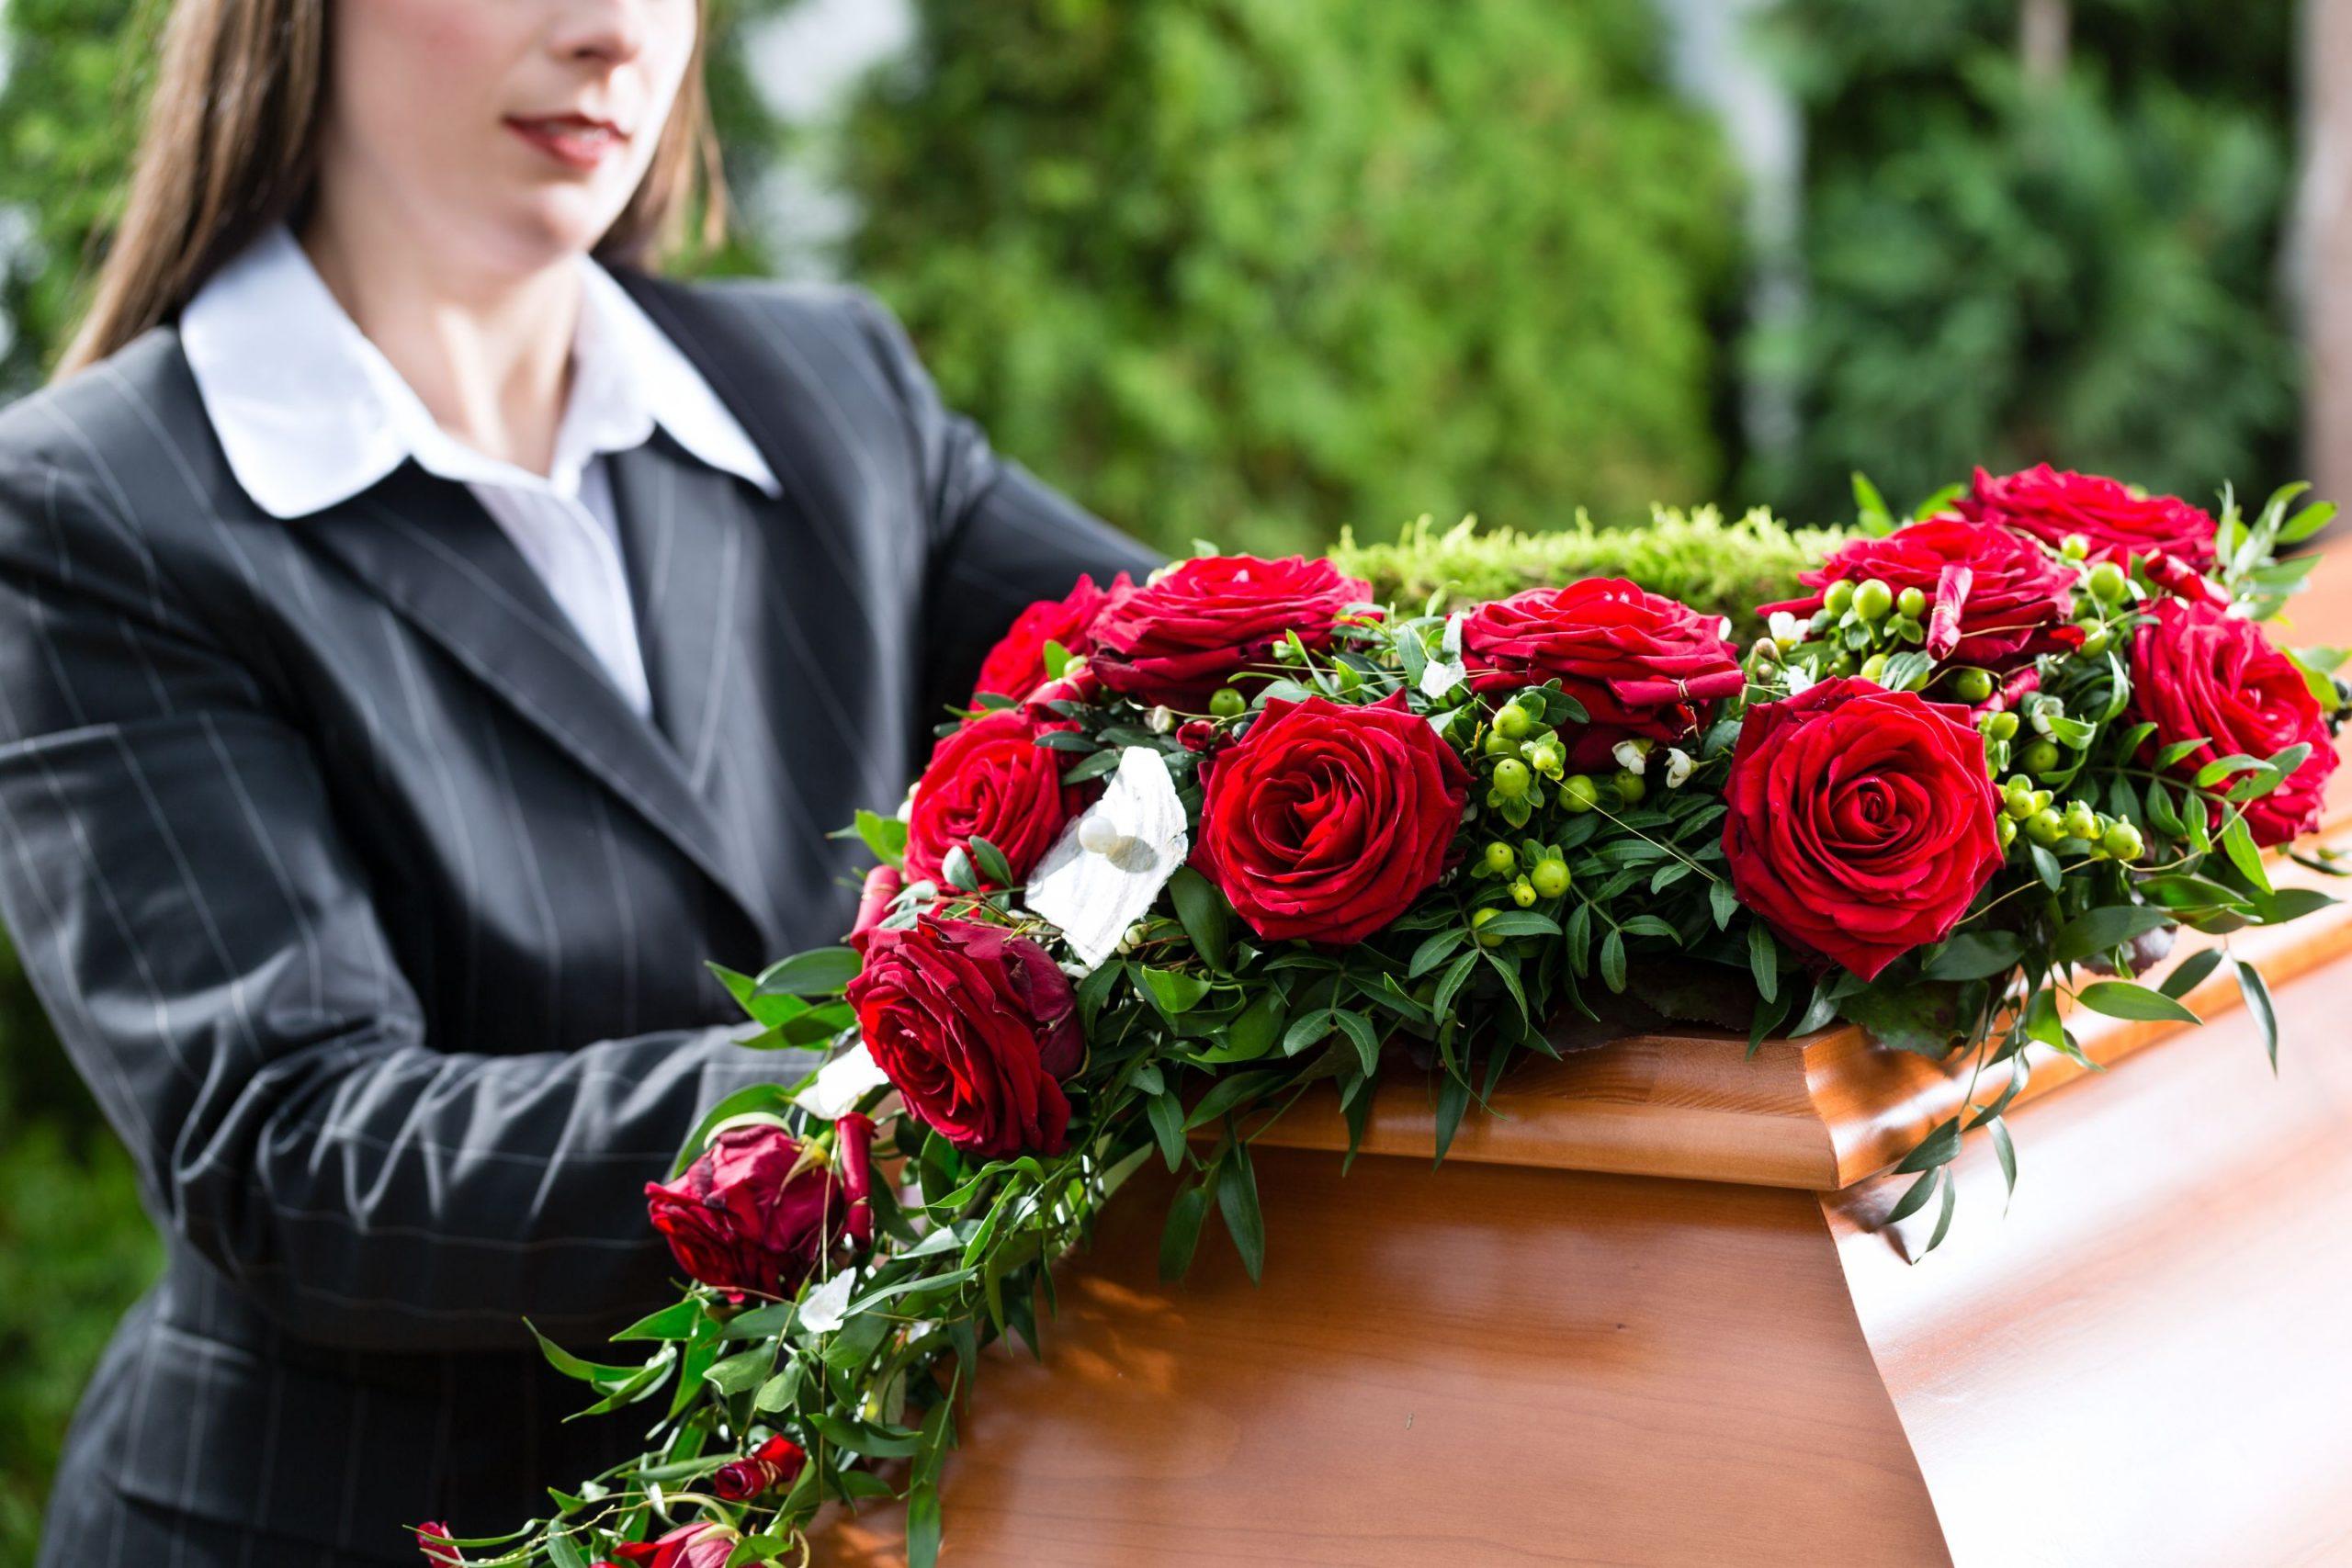 salon funeraire gaspesie prearrangements